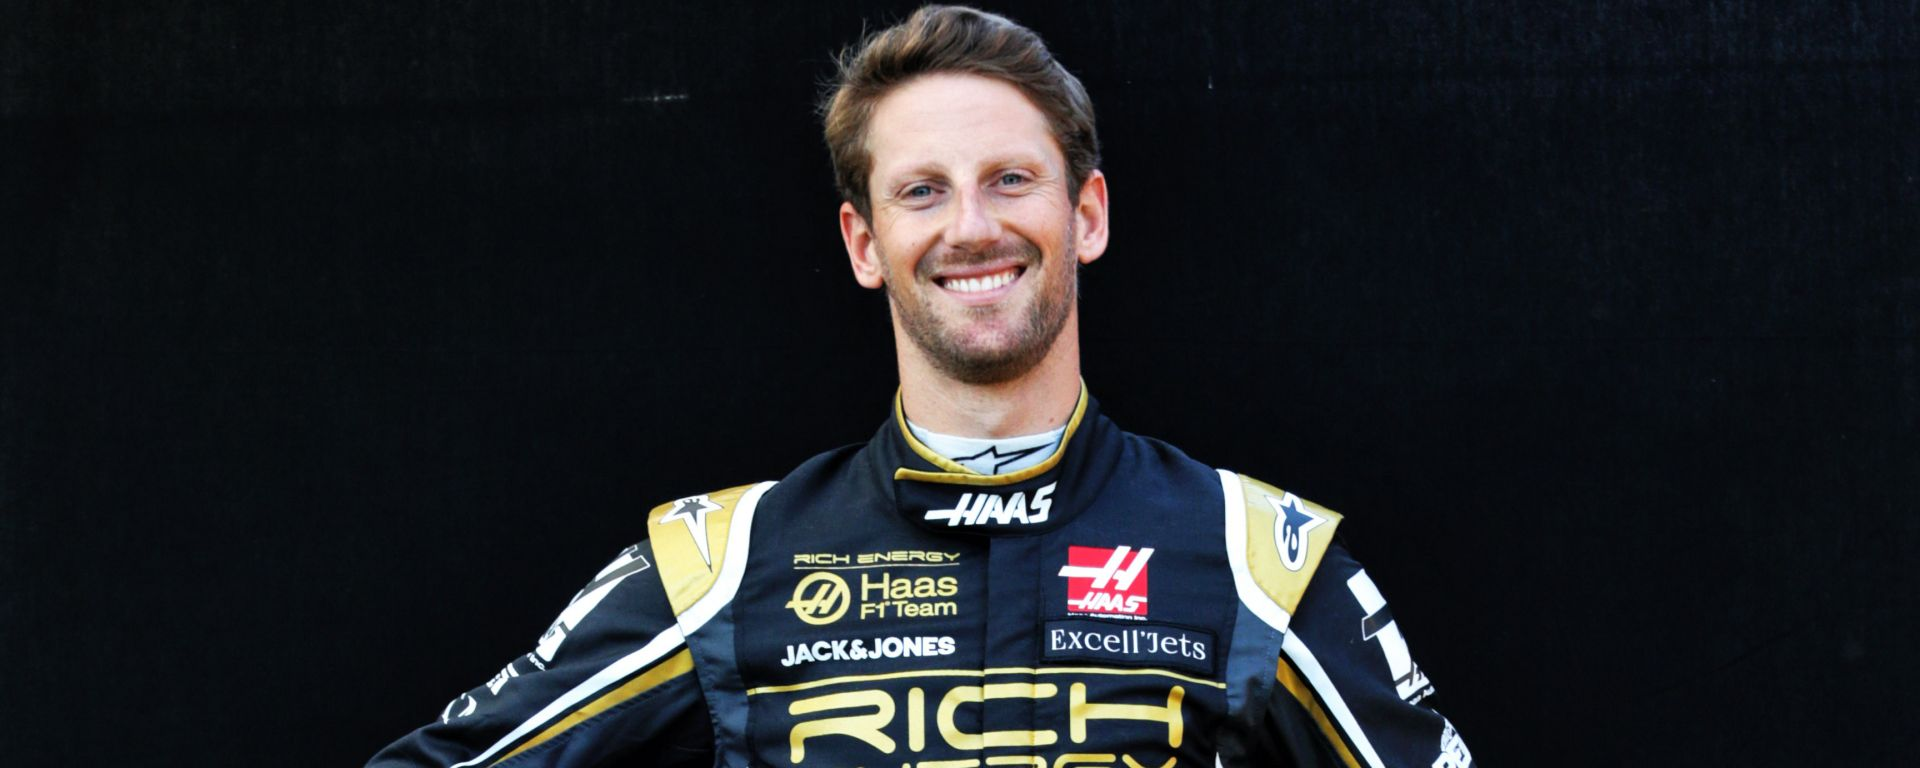 Romain Grosjean #8 F1 2019